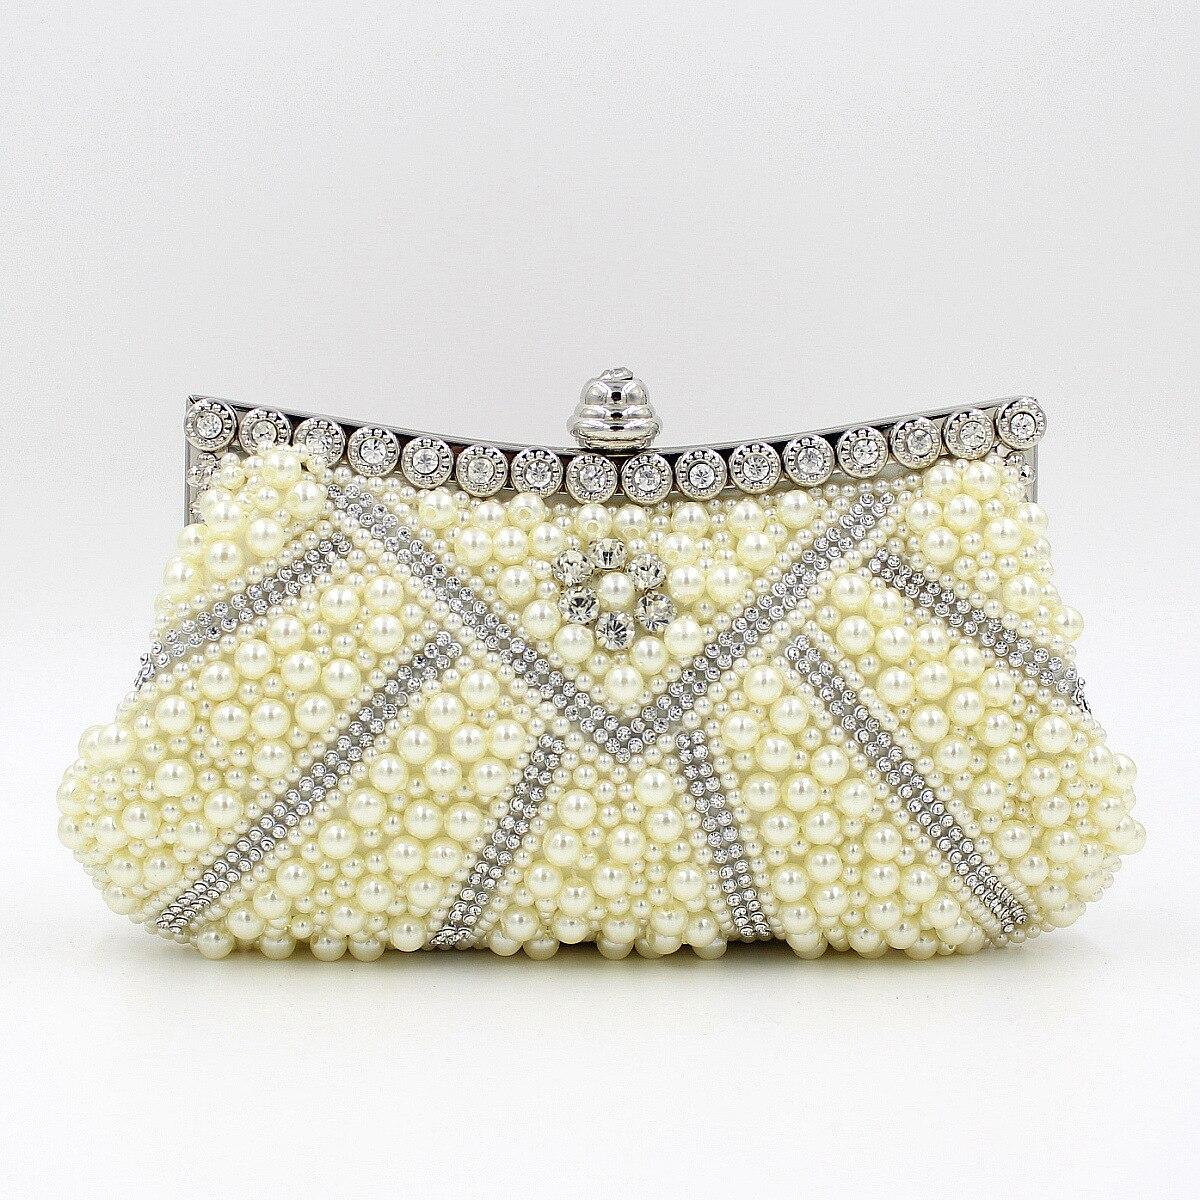 c393ae7107 Women Bridal Pearl Clutch Purse Wedding Crystal Bride Beaded Shoulder Bags  Handbag Ladies Metal Frame Clutches Bolsas De Noche